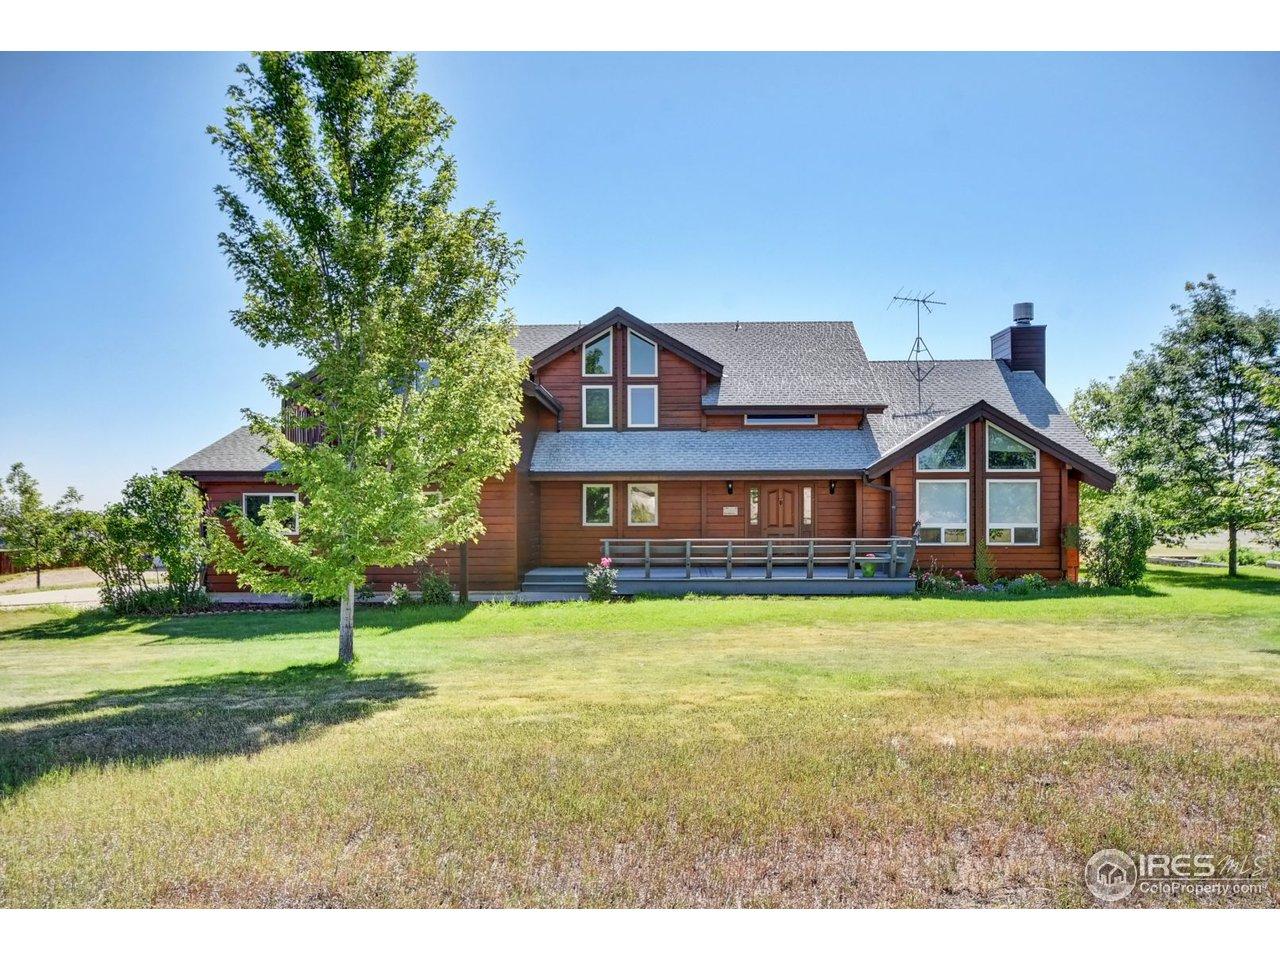 1338 Rue De Trust Erie Co 80516 House For Sale In Erie Co